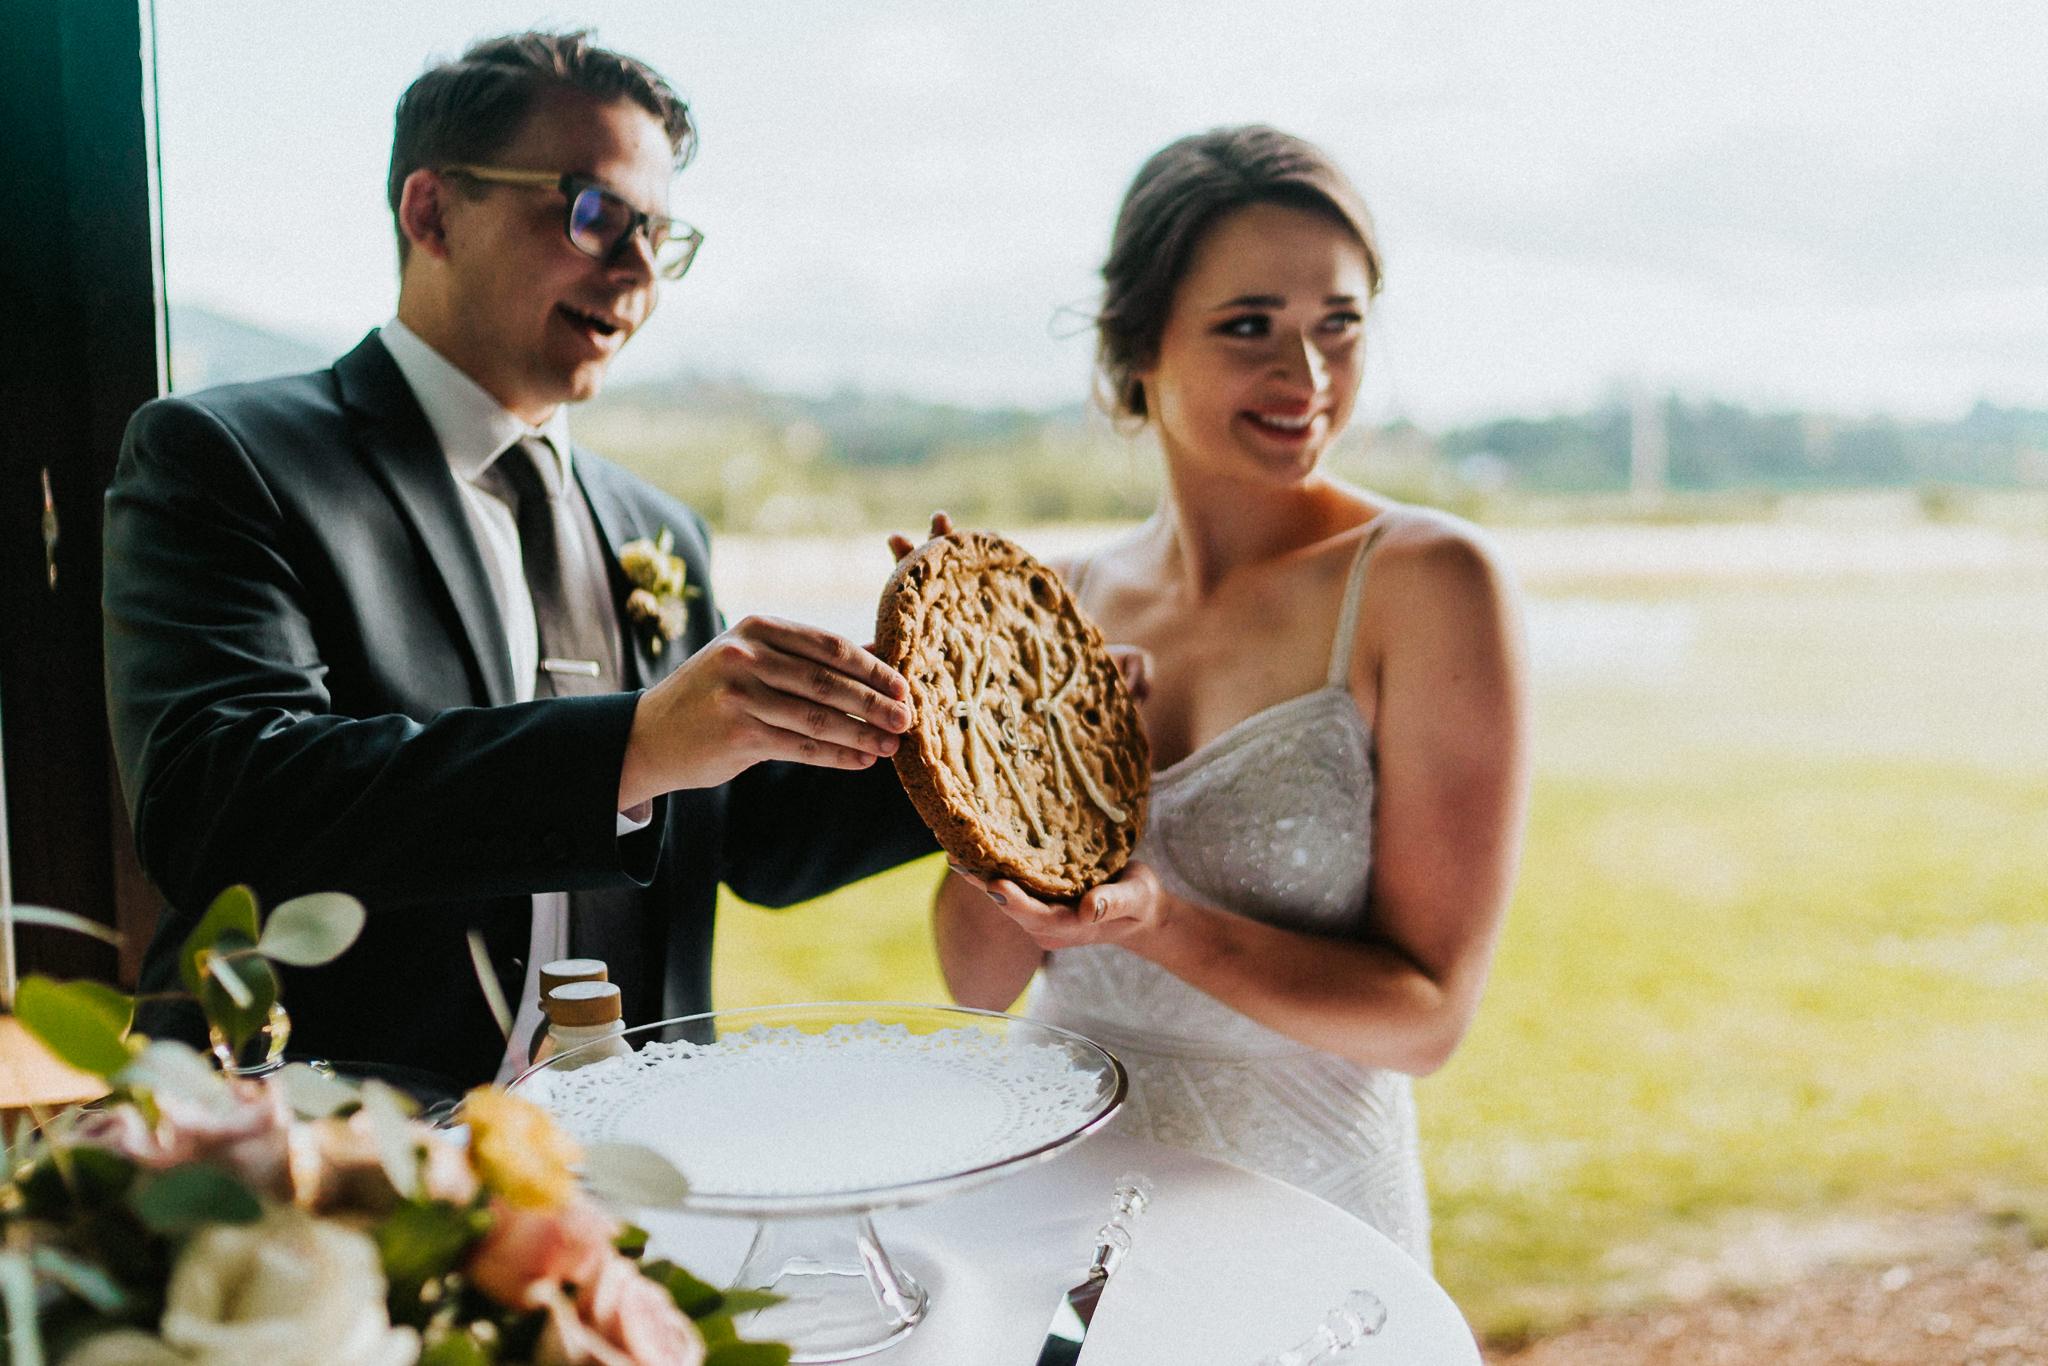 Wedding Cookie cake Bride Groom idea icing